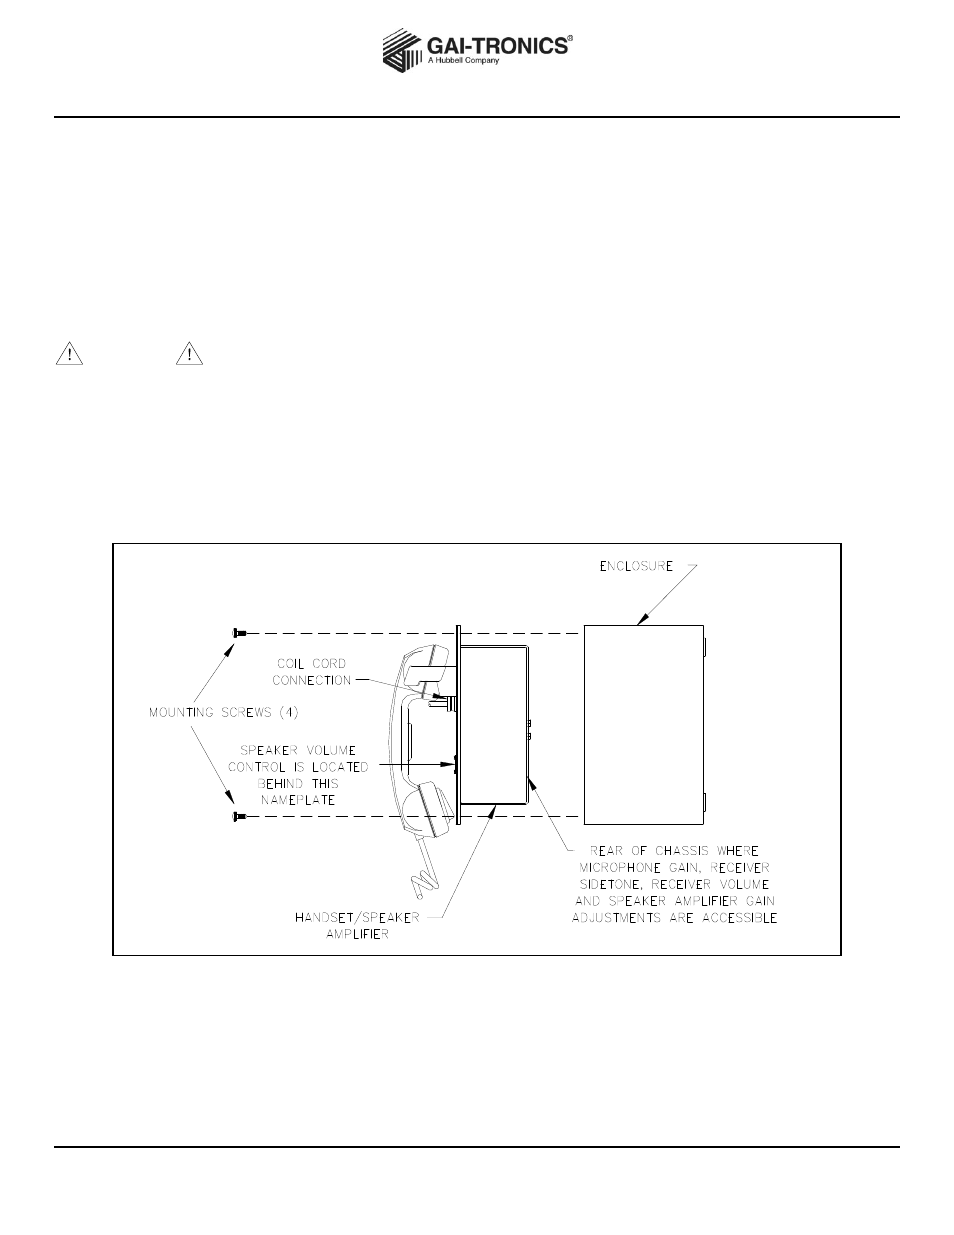 GAI-Tronics 701-307 Page/Party Handset / Speaker Amplifier (24 V DC